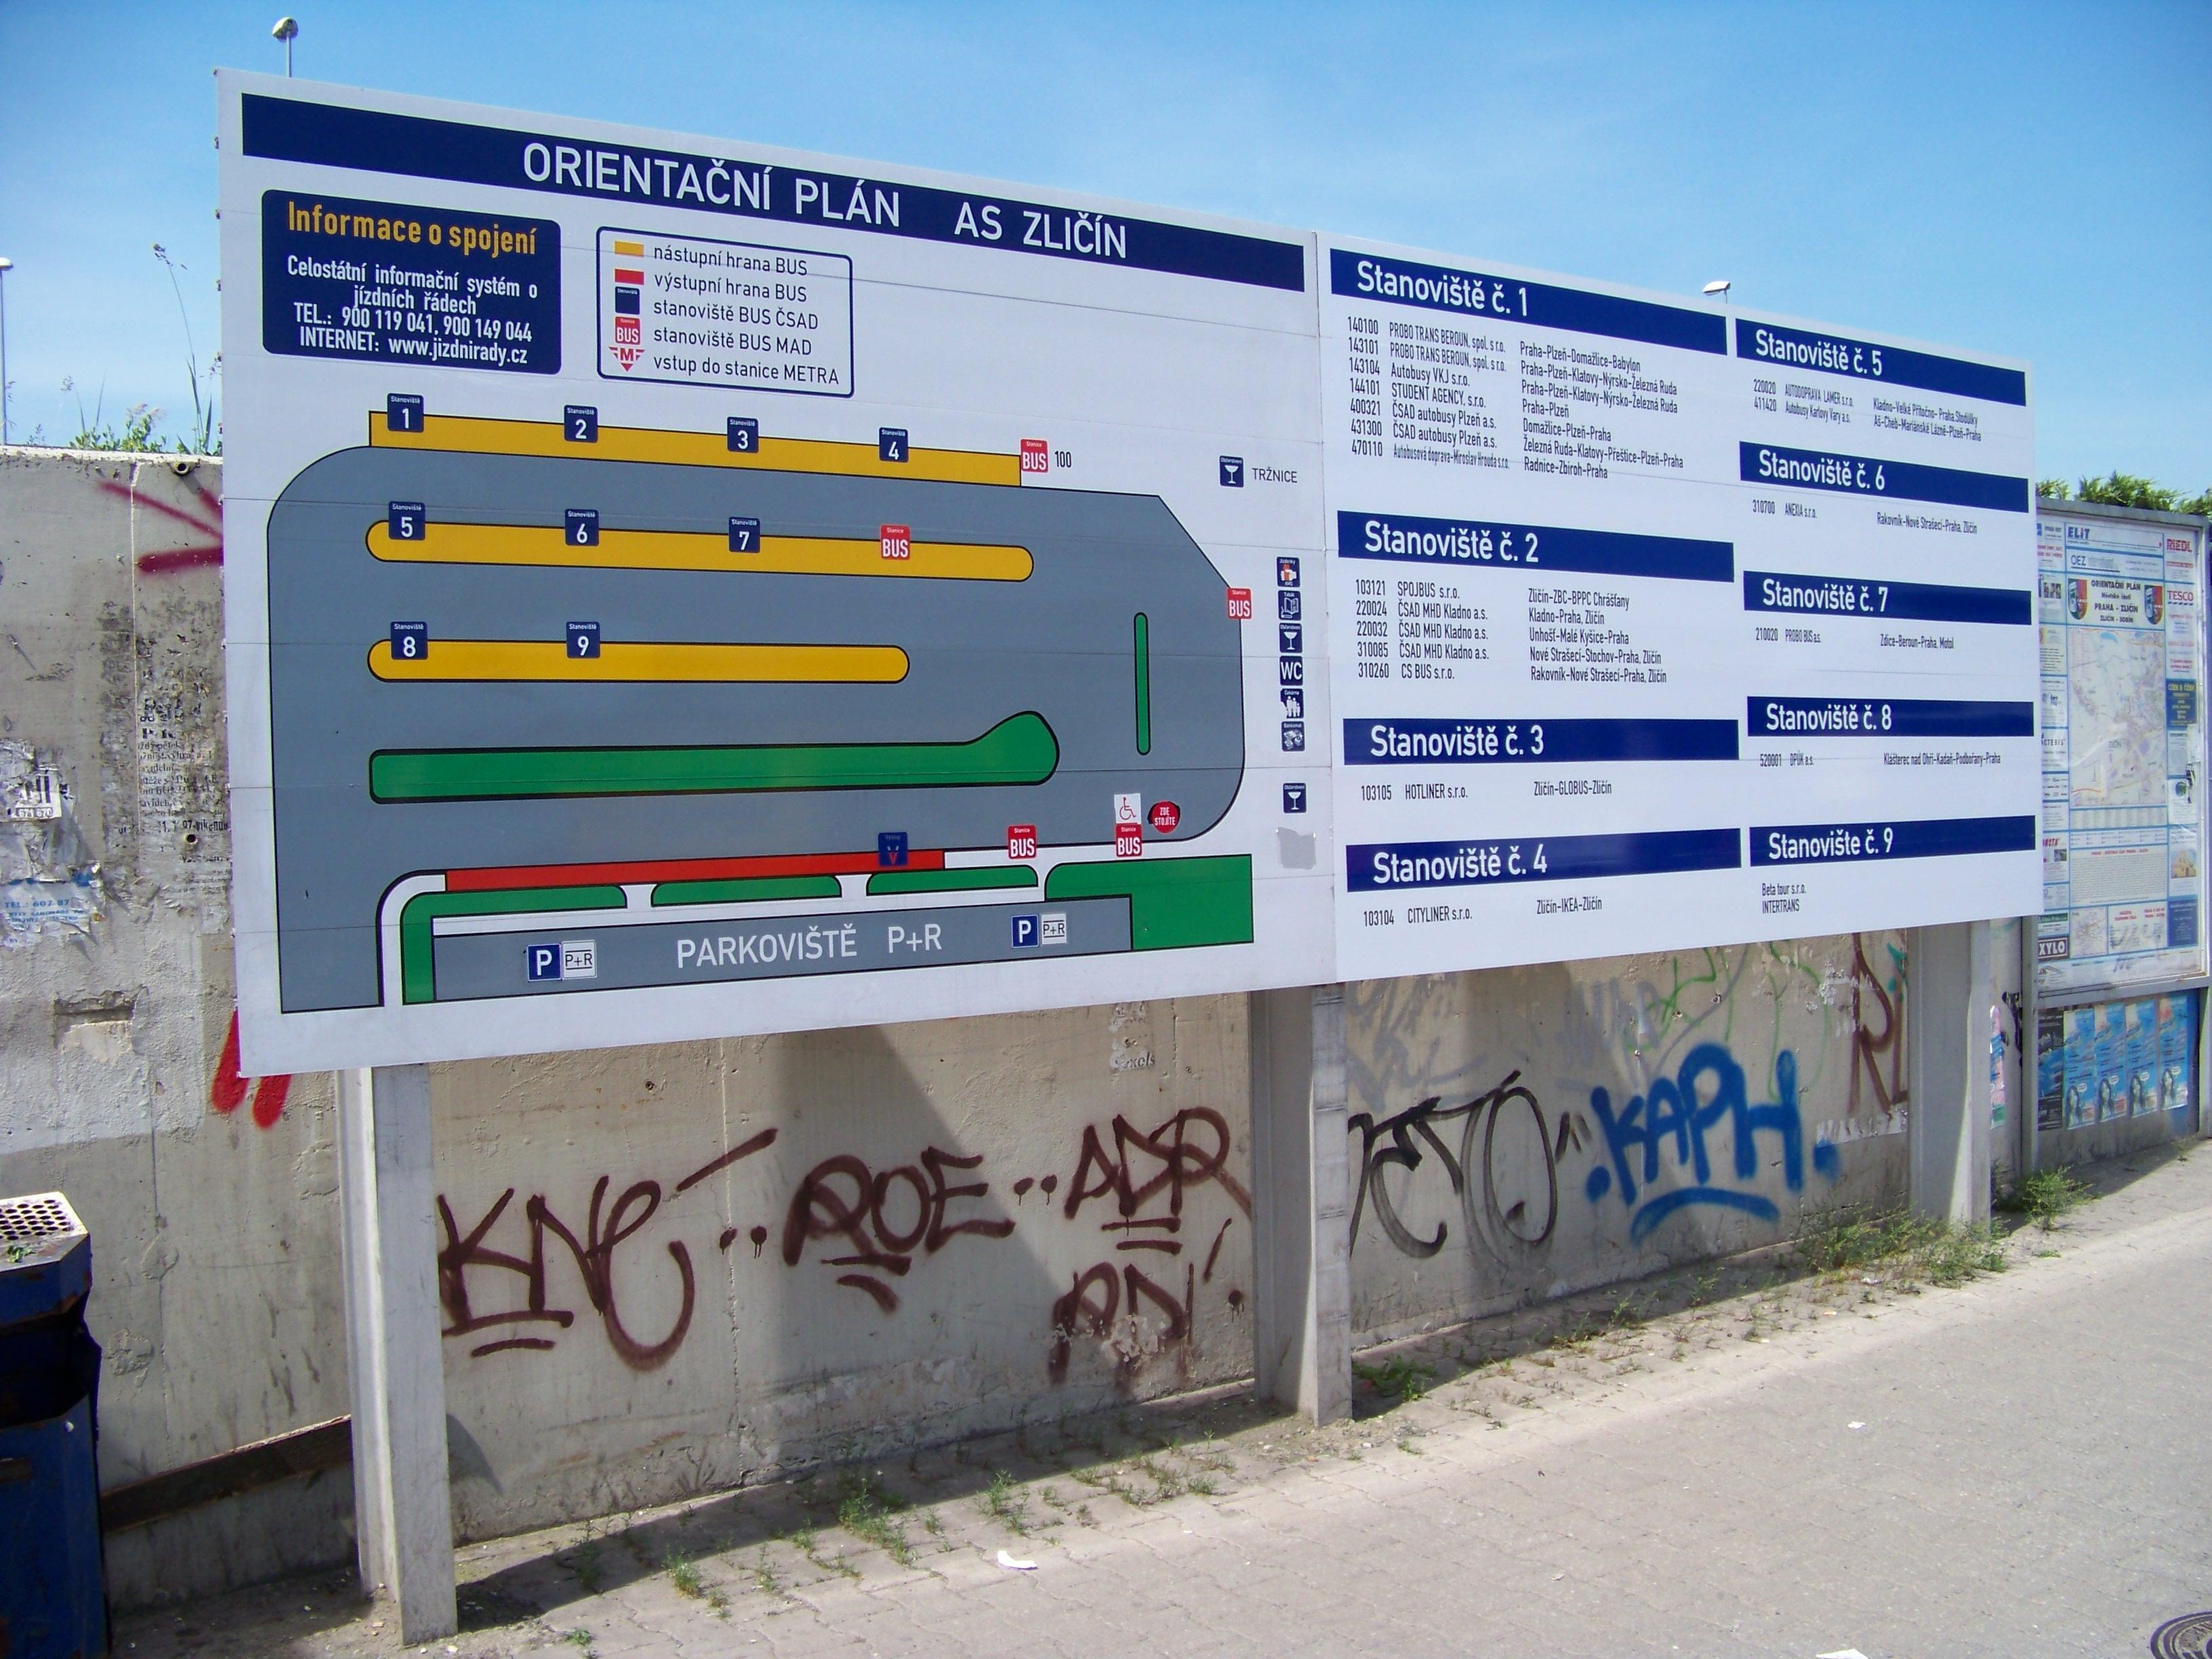 File Zlicin Orientacni Plan Autobusoveho Stanoviste Jpg